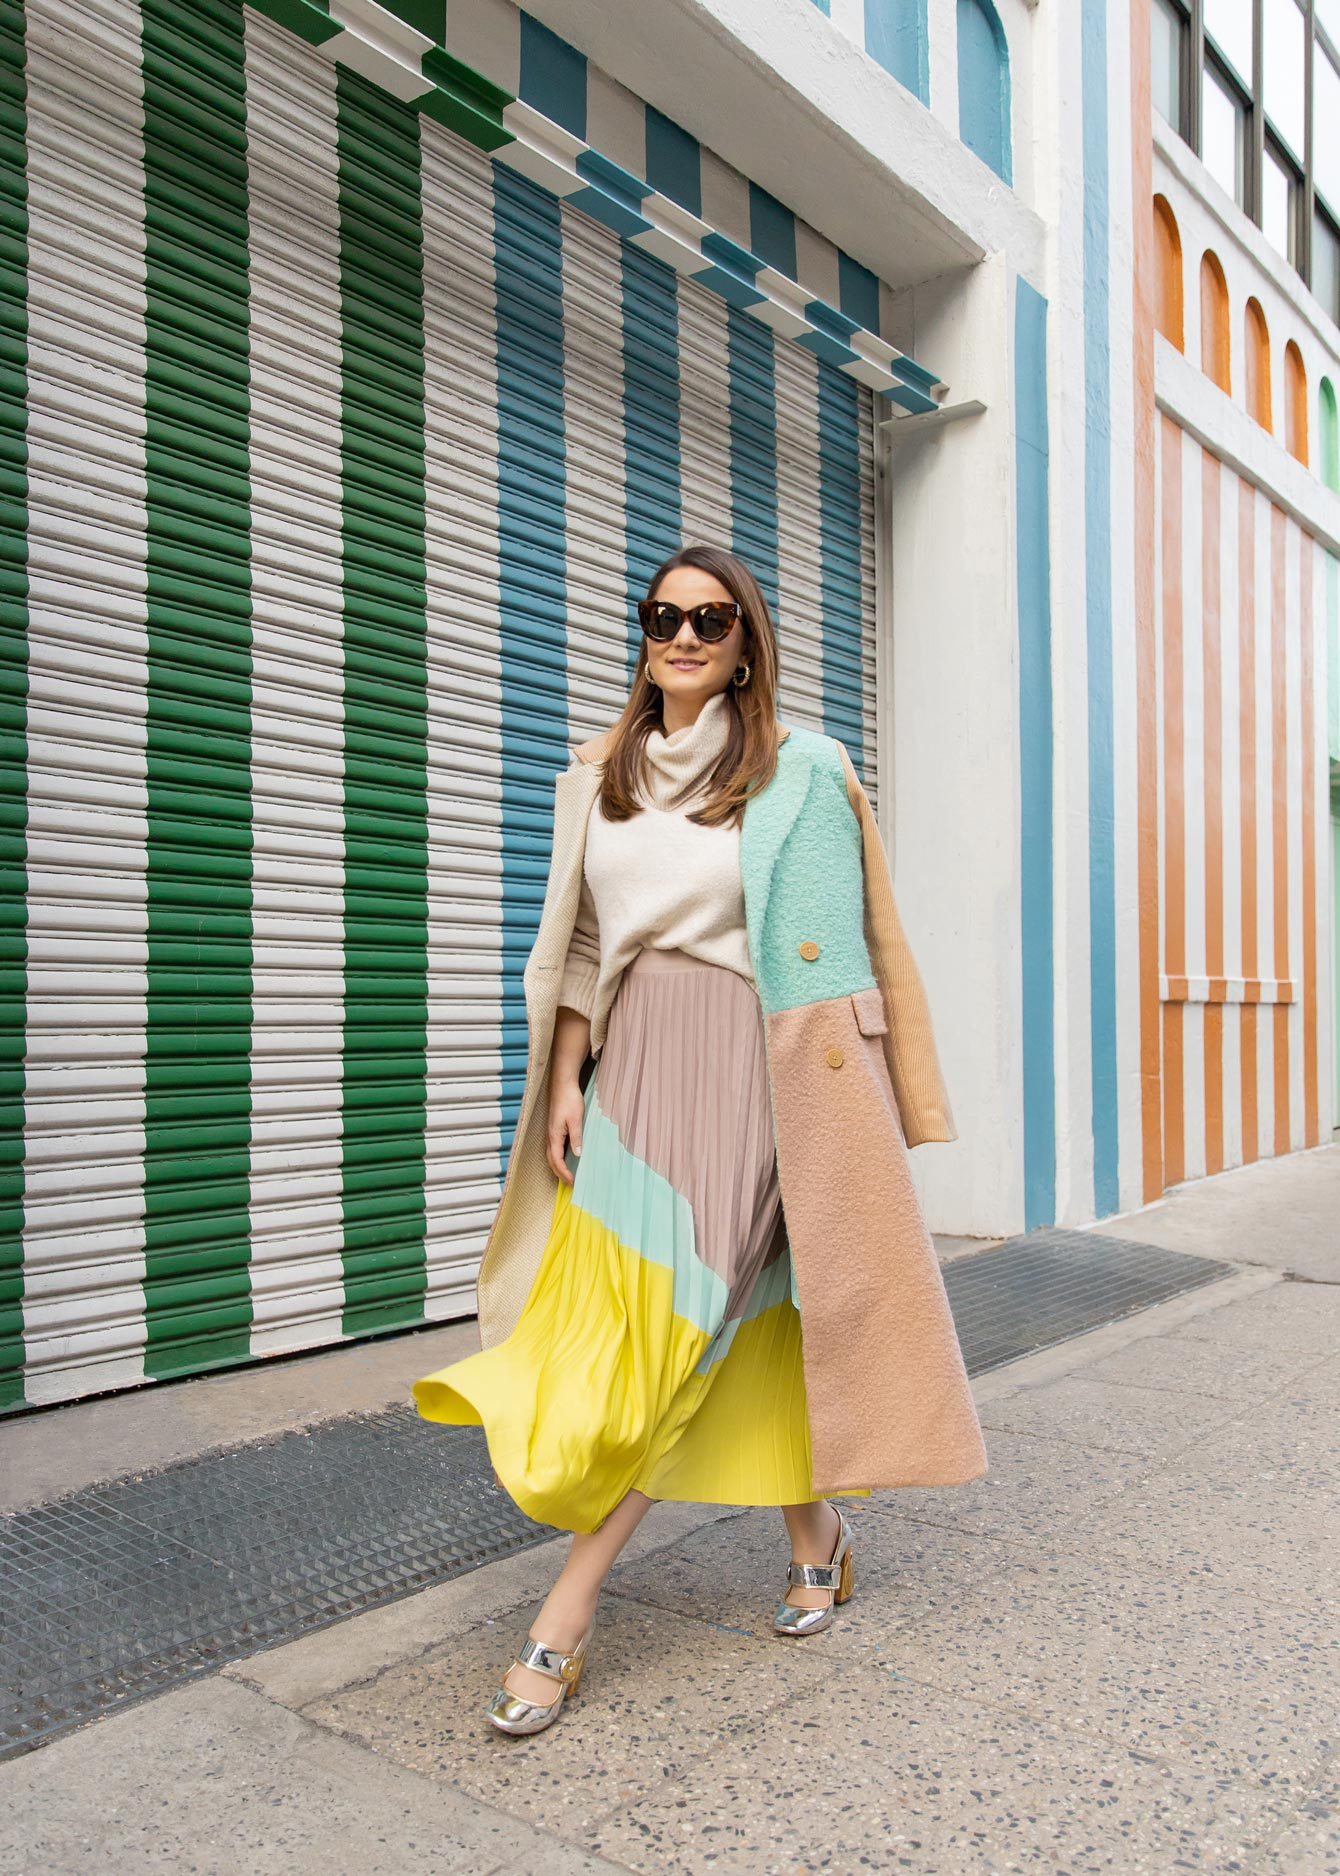 Jennifer Lake Color Block Outfit